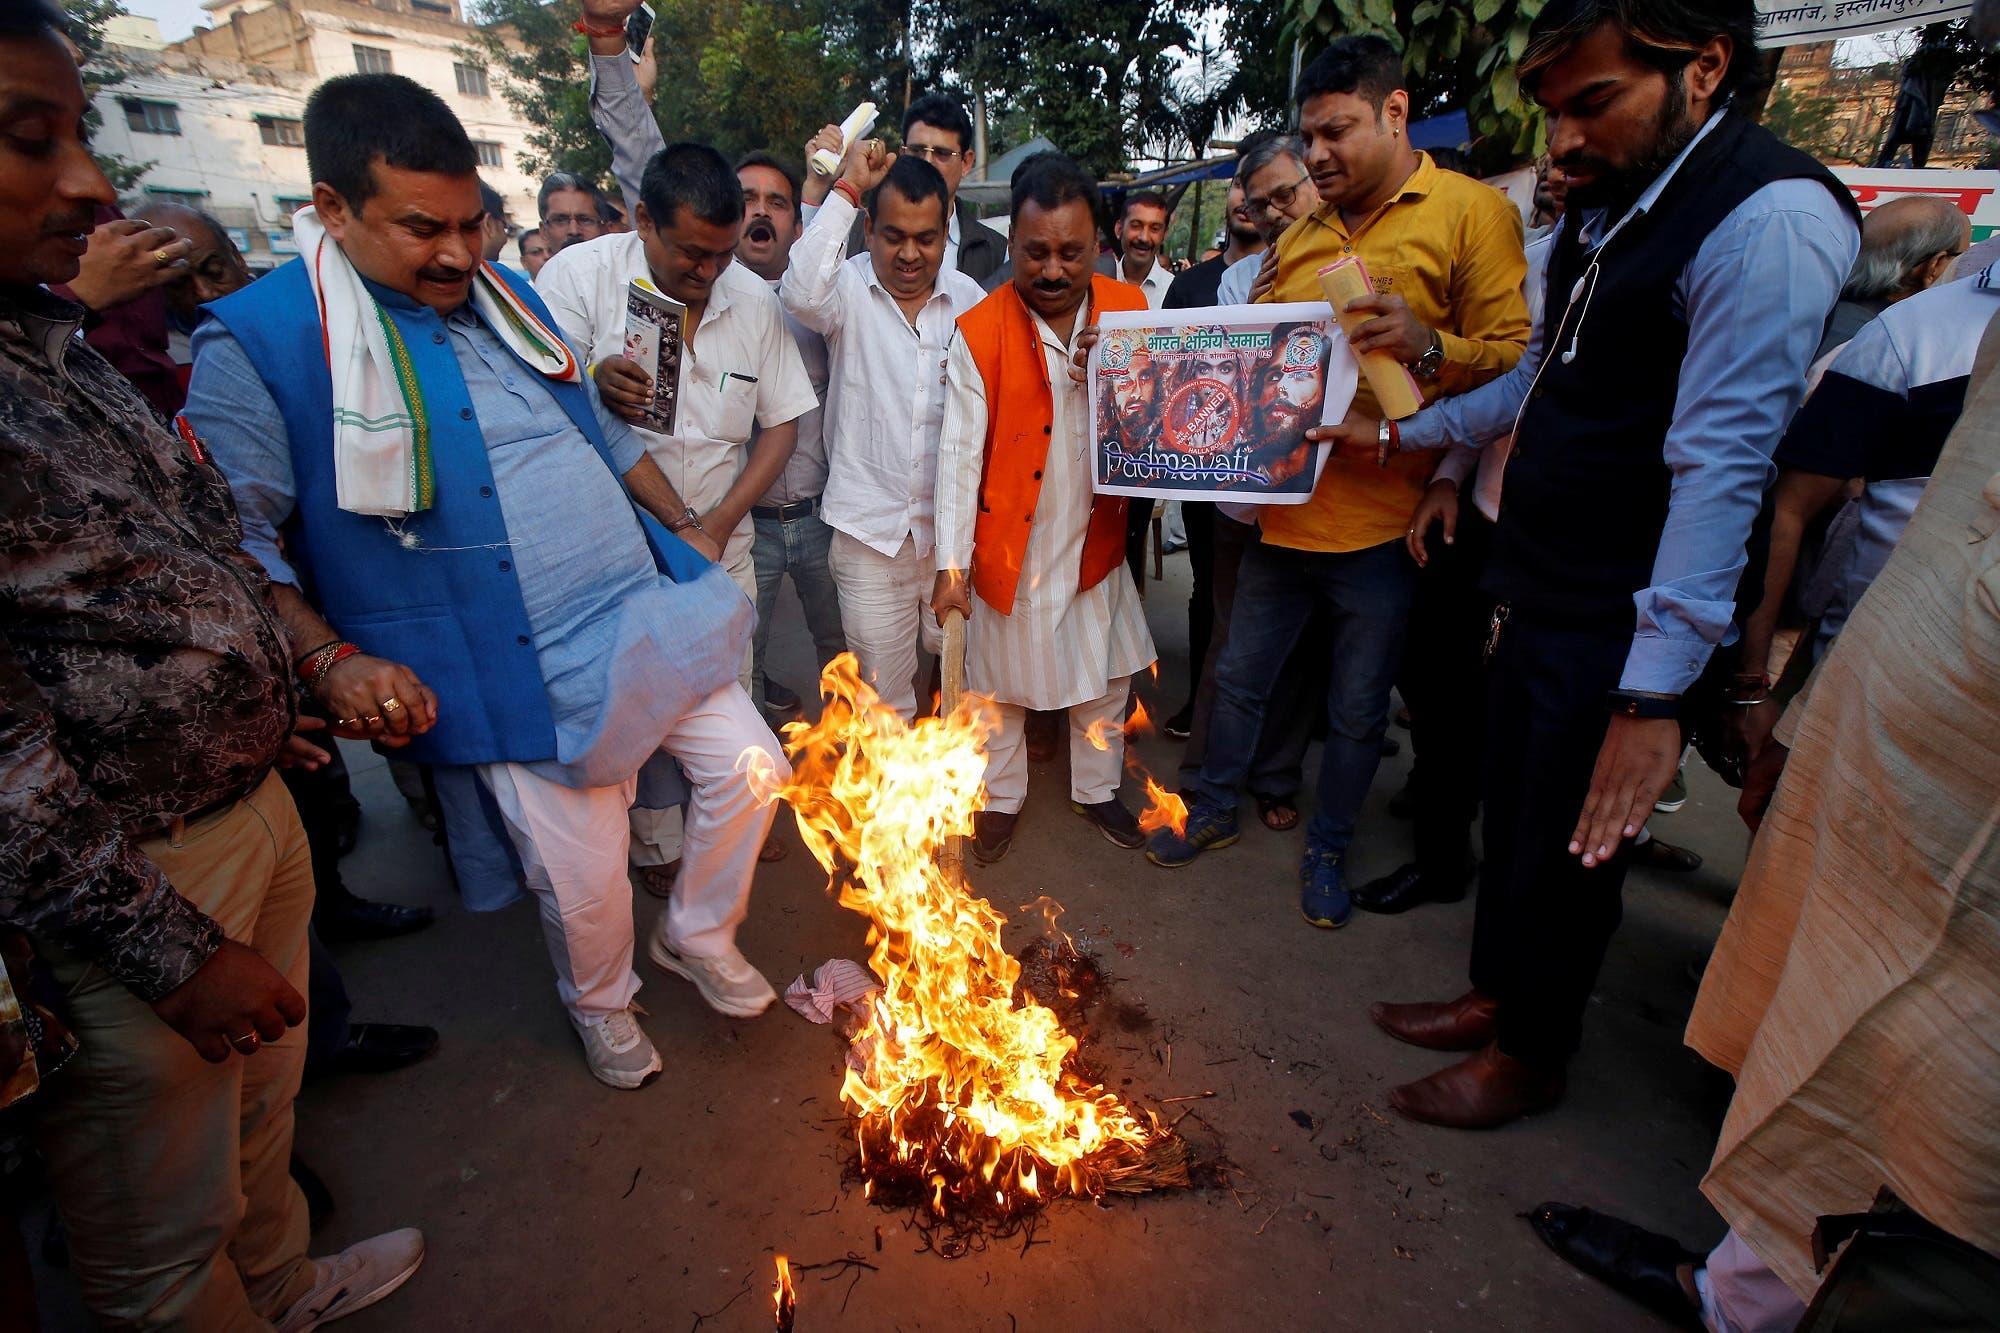 "Demonstrators burn an effigy depicting film director Sanjay Leela Bhansali during a protest against ""Padmavati"" in Kolkata on November 22, 2017. (Reuters)"